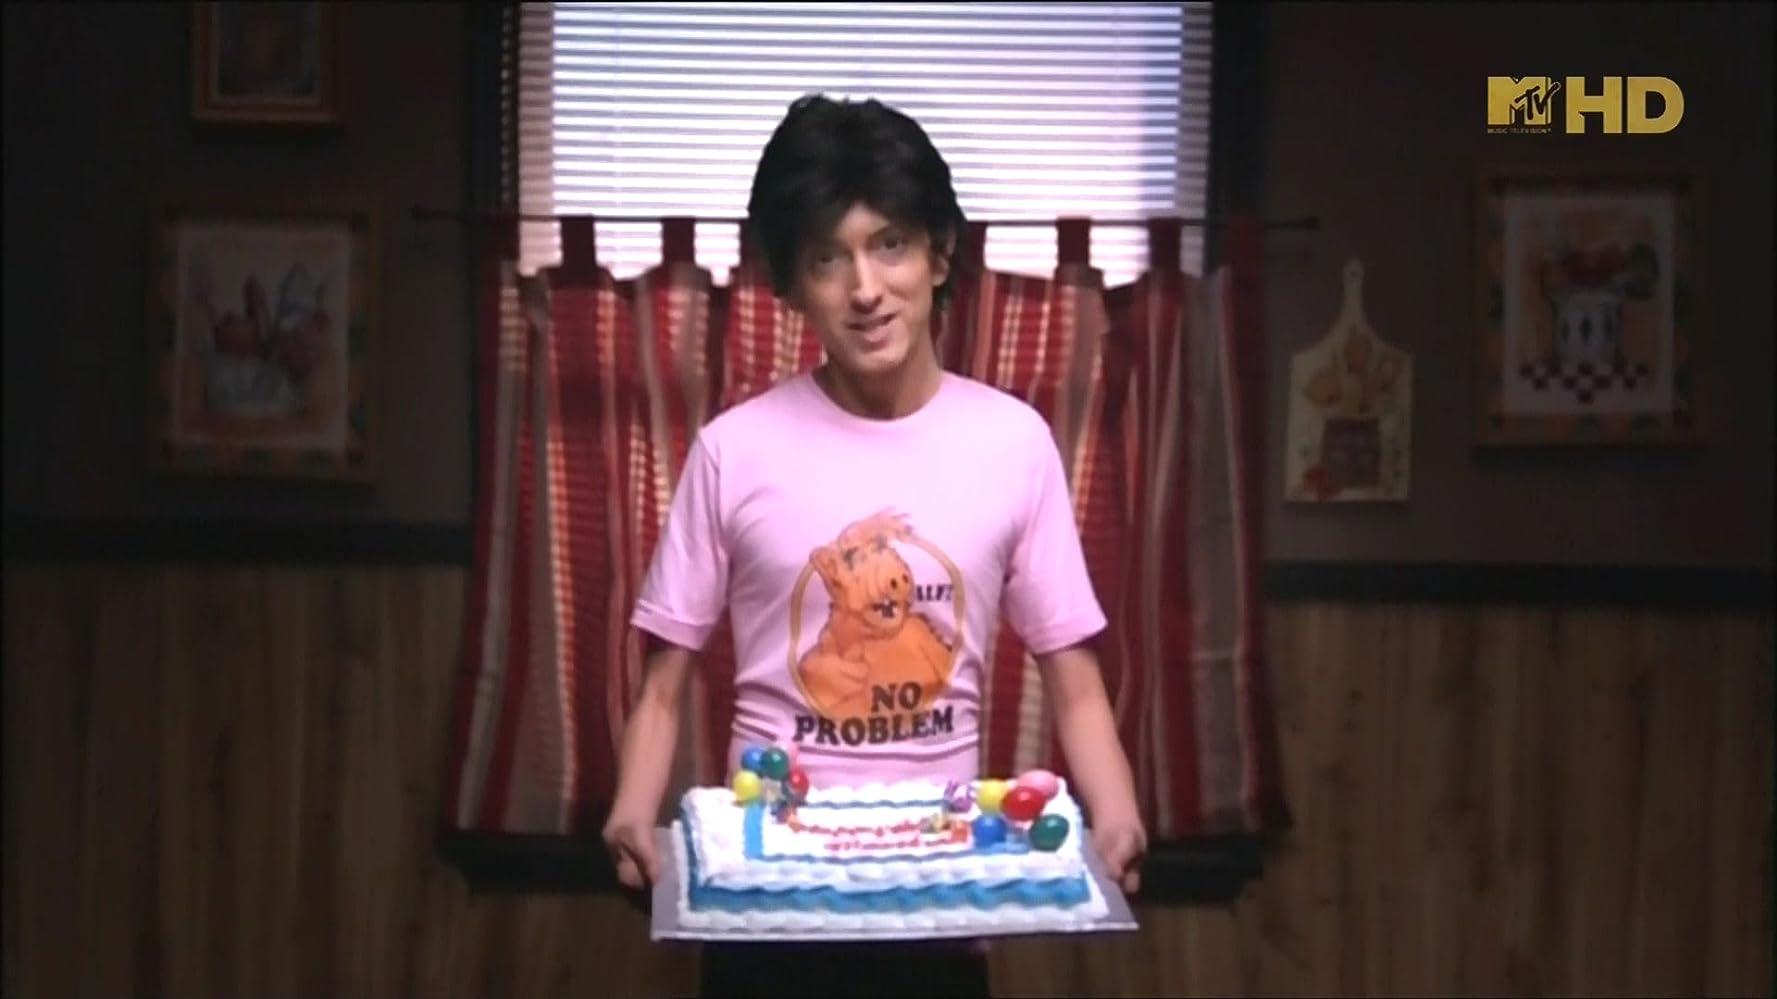 Terrific Eminem We Made You 2009 Funny Birthday Cards Online Bapapcheapnameinfo